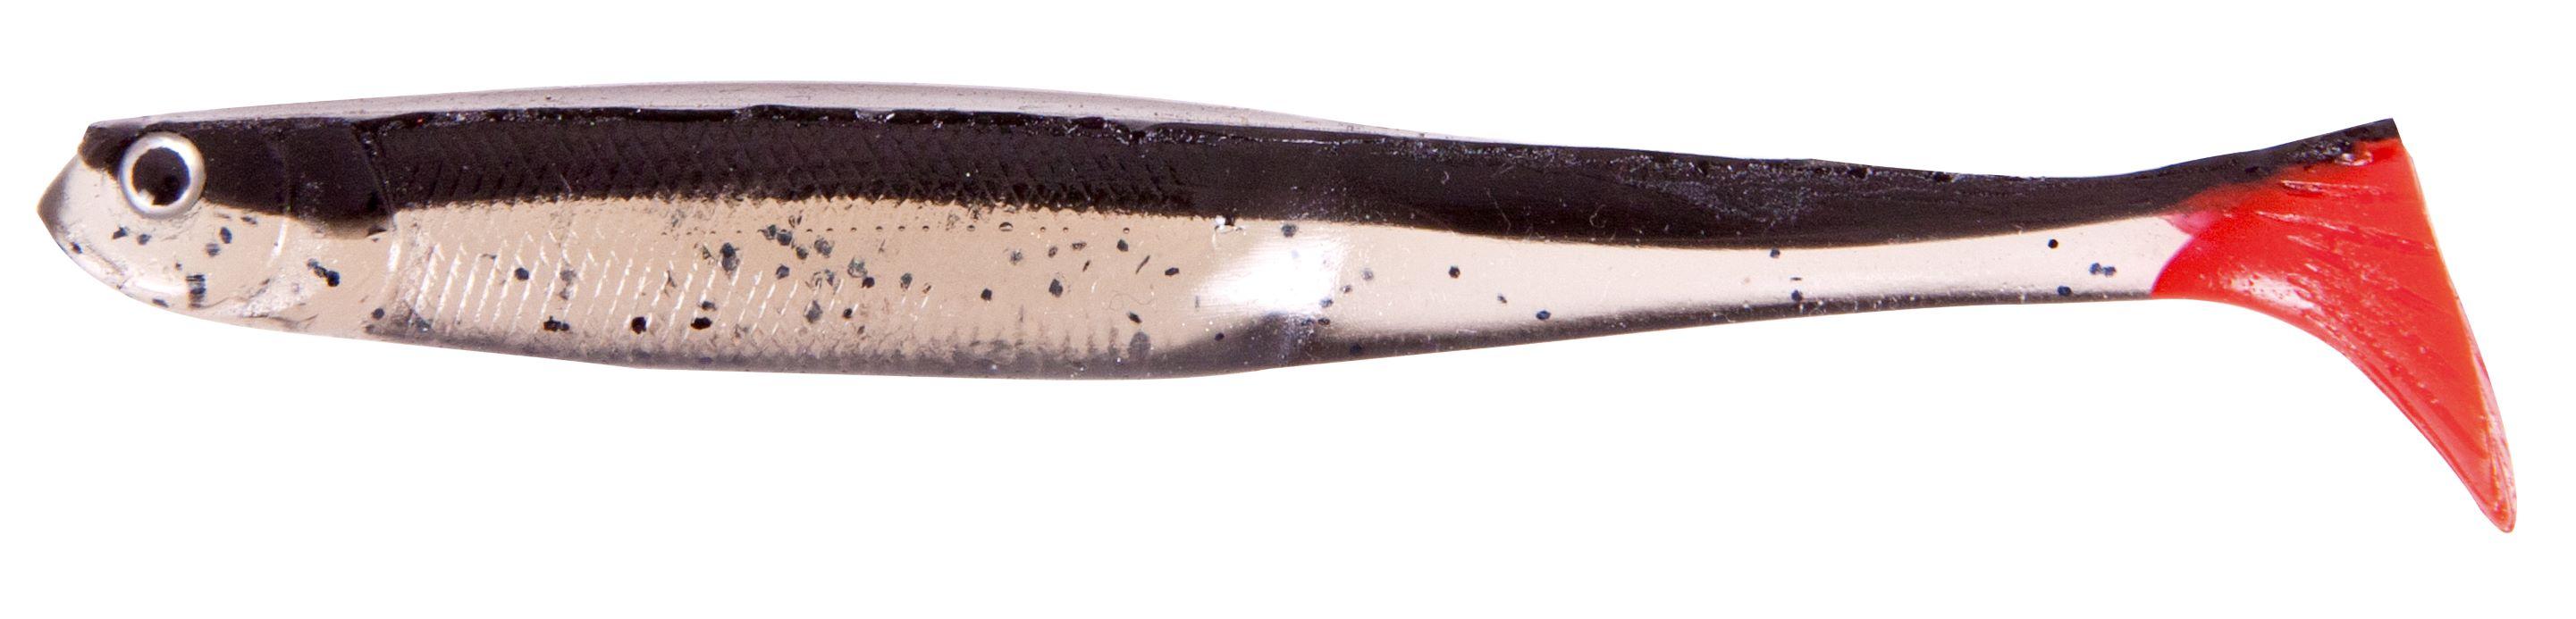 Iron Claw gumová nástraha Slim Jim 7 cm Vzor CB, 3 ks